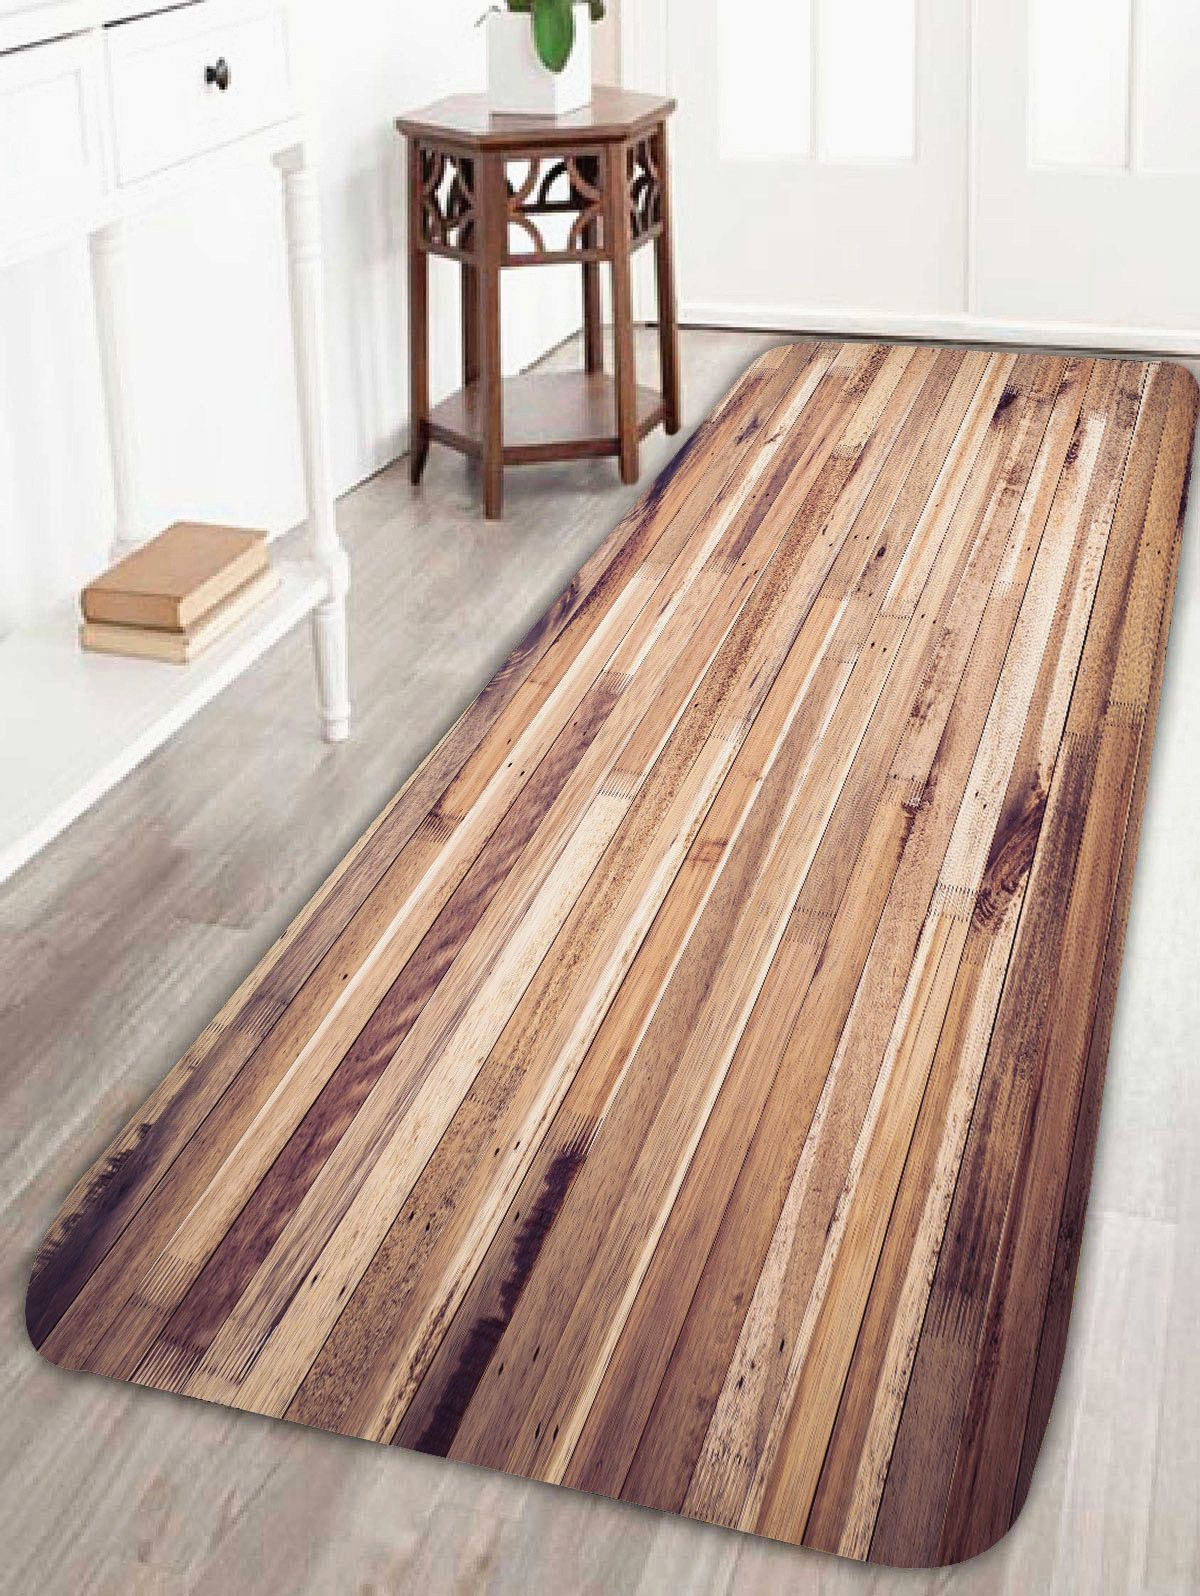 Awe Inspiring Vintage Wood Grain Pattern Antiskid Bath Rug For The Home Beutiful Home Inspiration Semekurdistantinfo